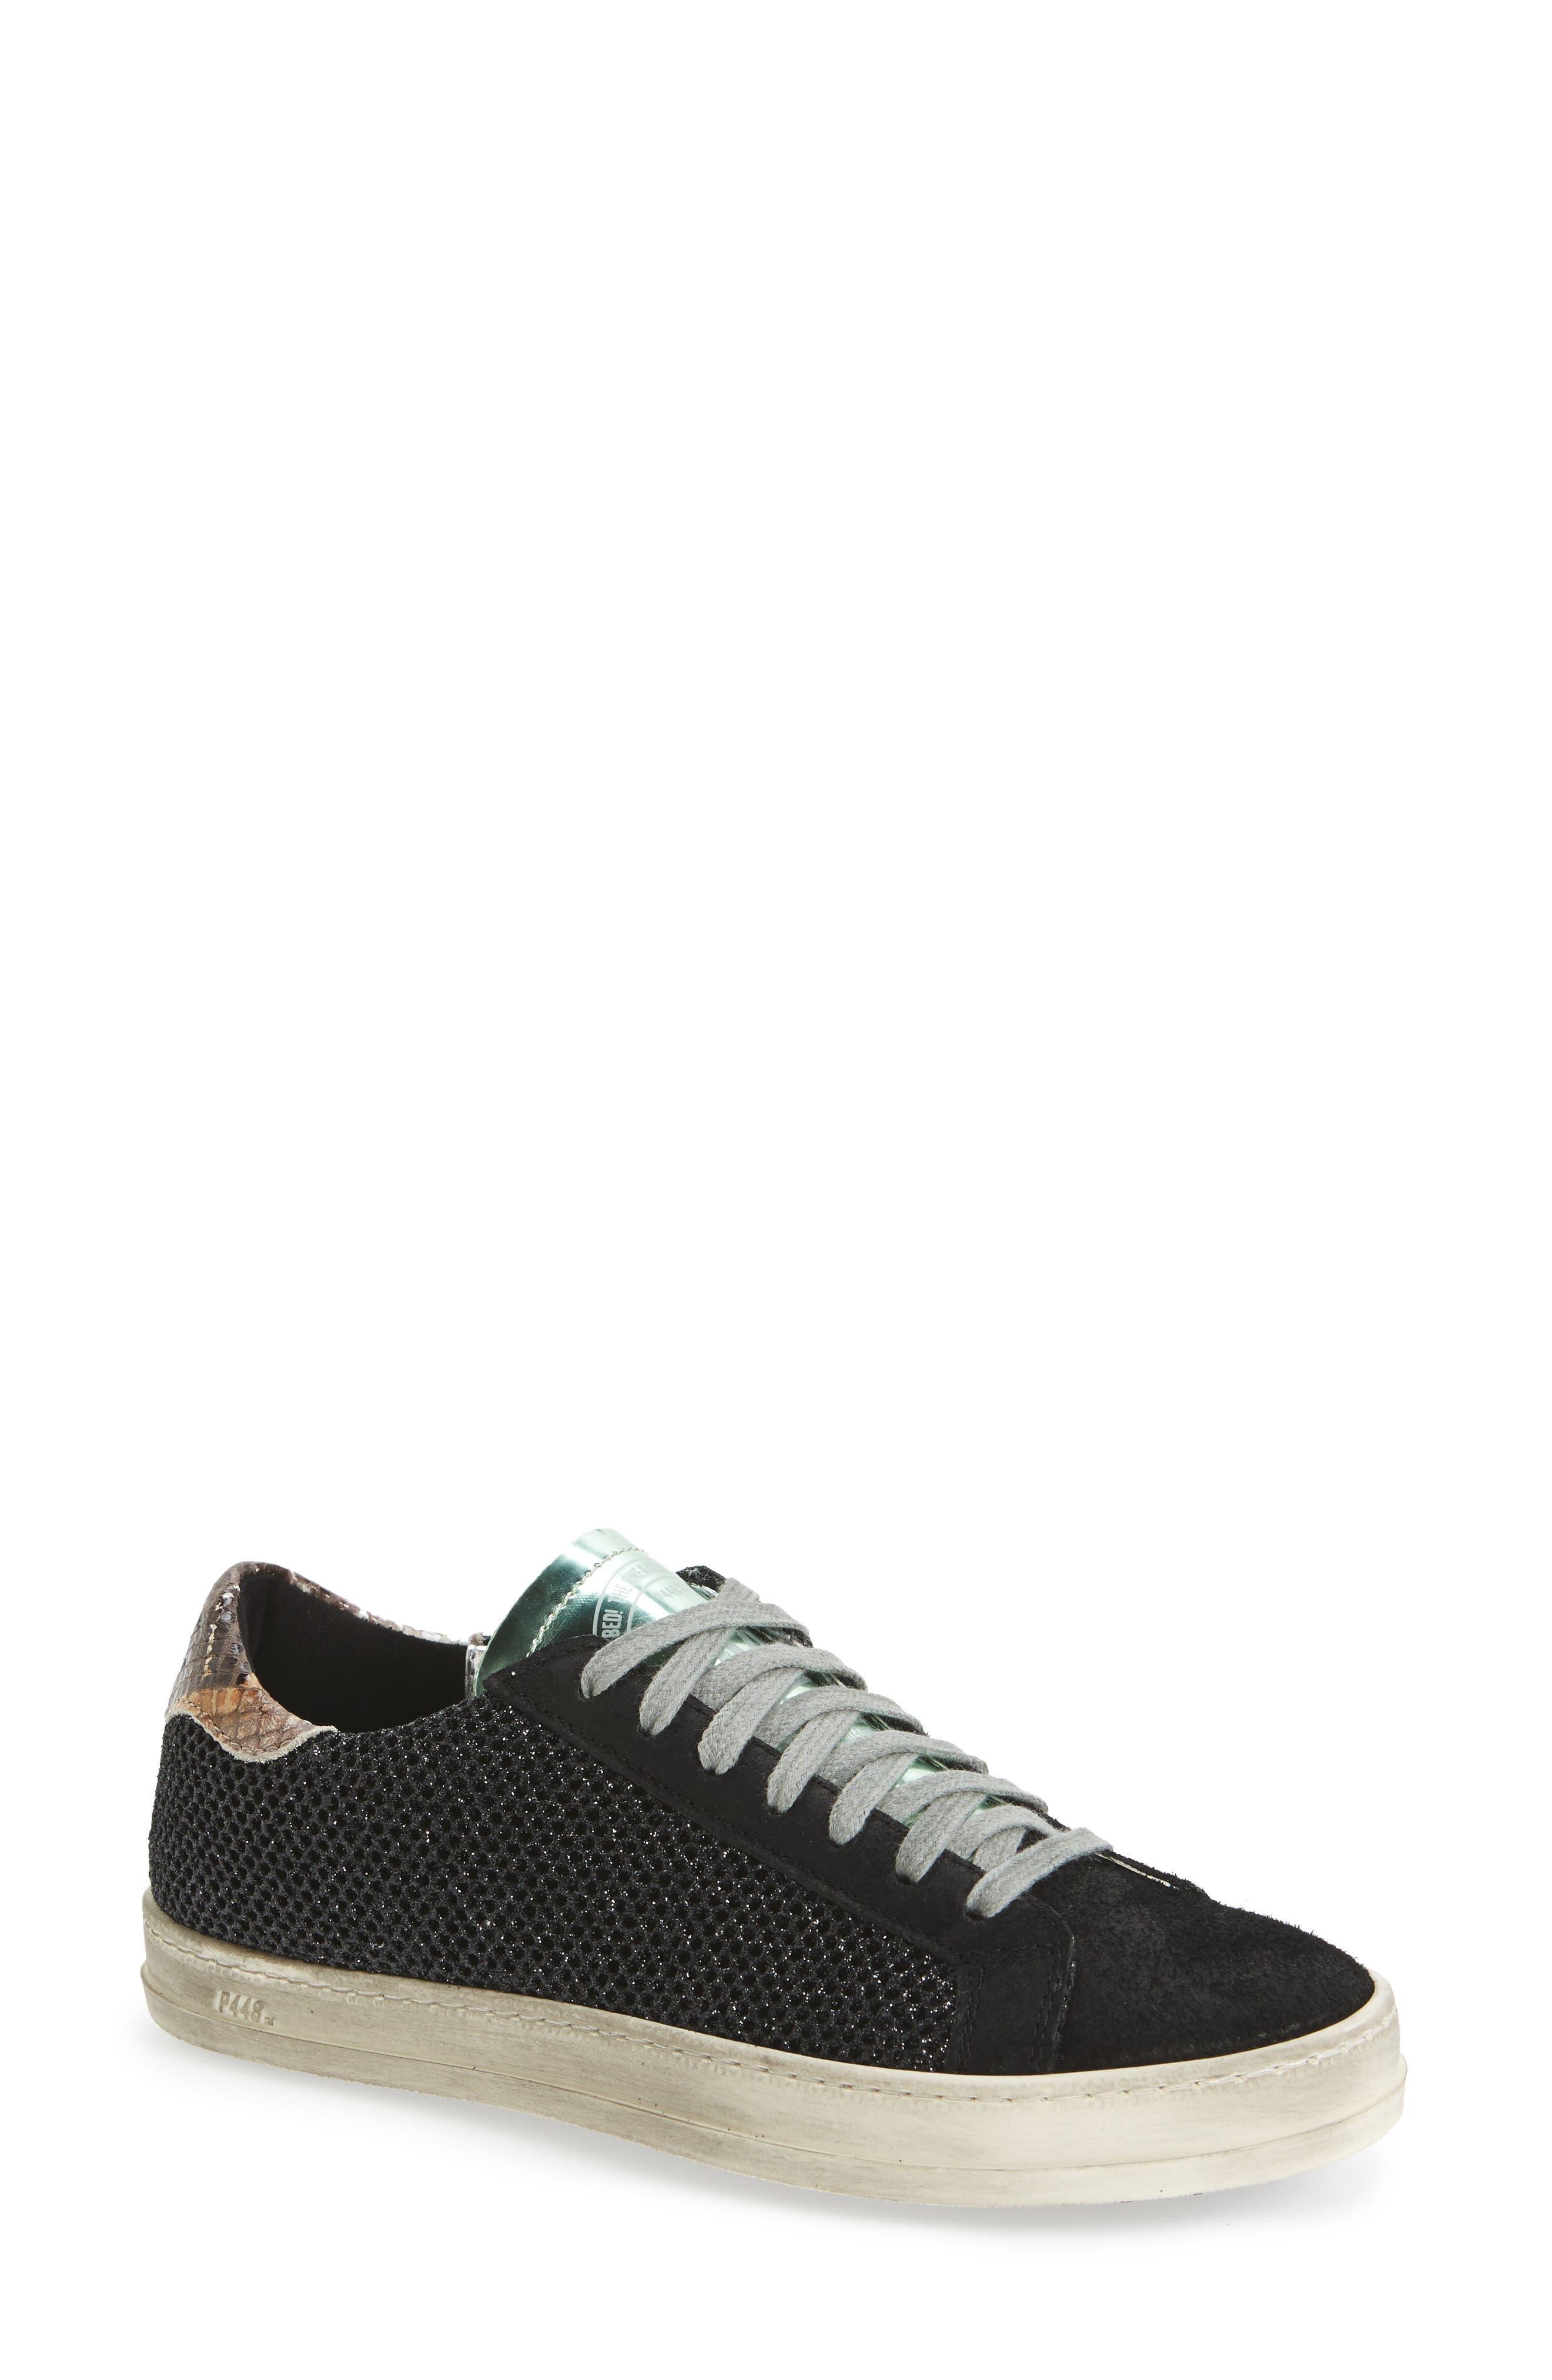 John Sneaker,                             Main thumbnail 1, color,                             GLITTER TECHNICAL MESH